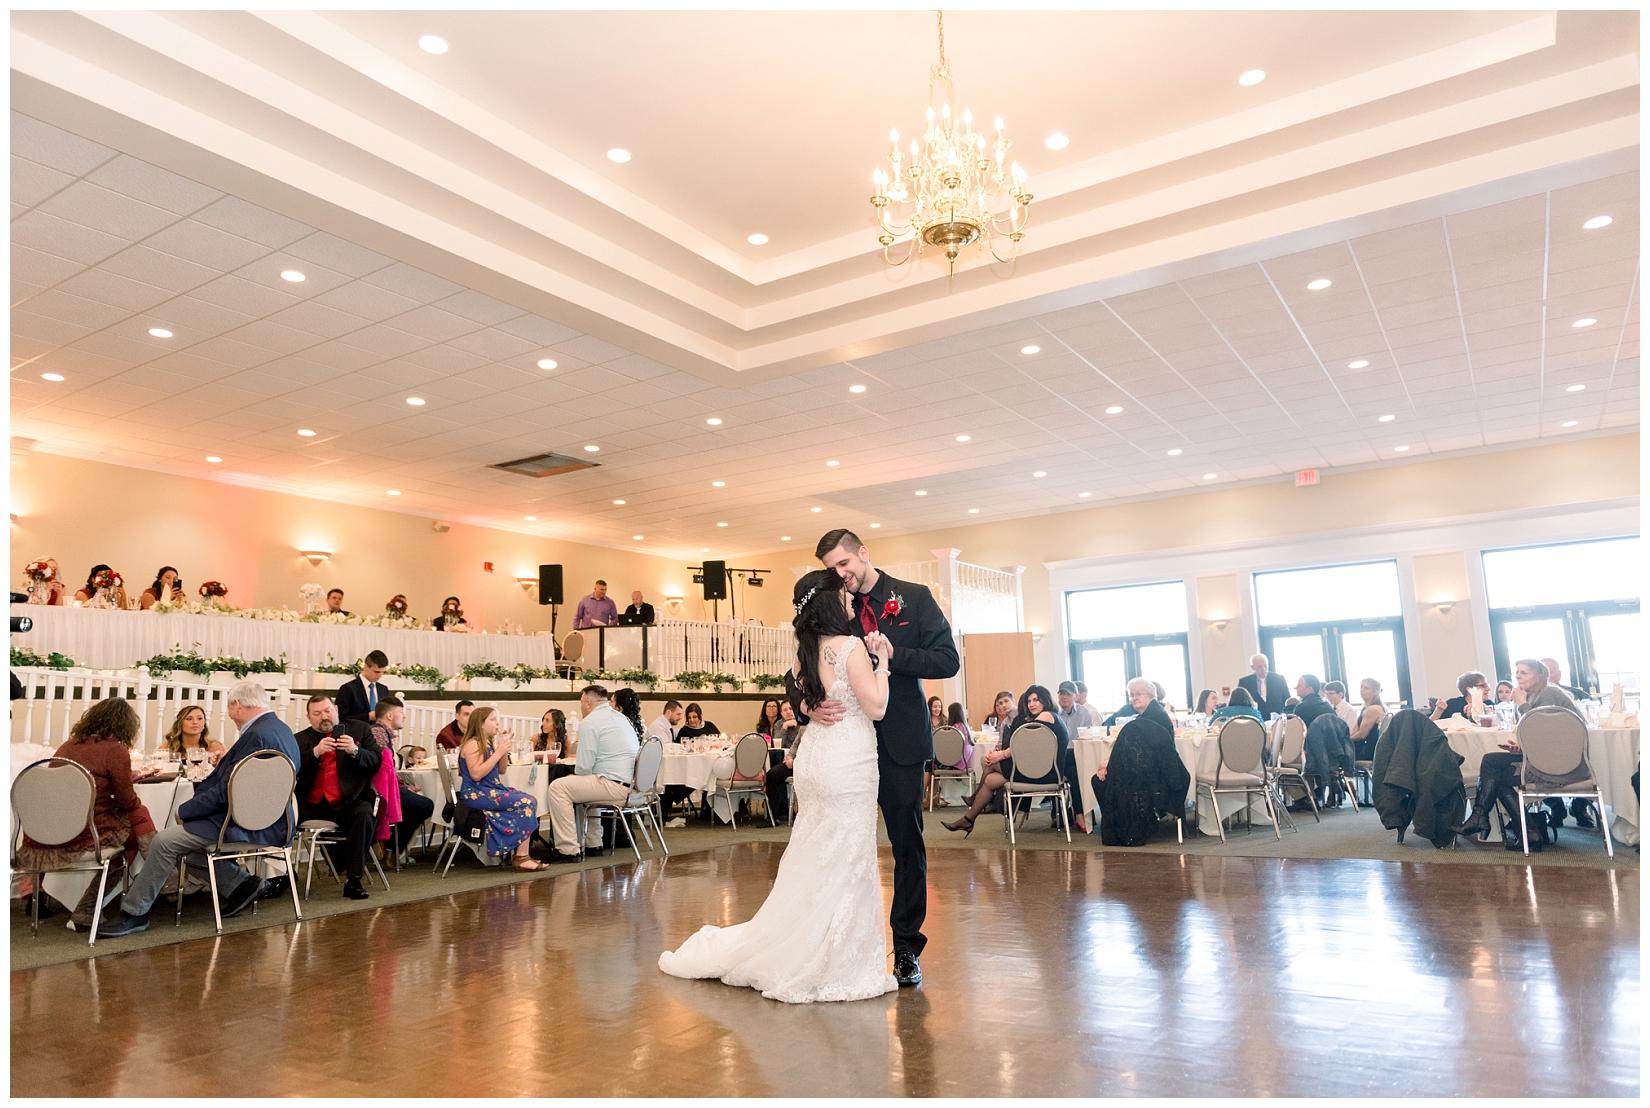 cat-alkire-wedding-photographer-indiana-chicago-indianapolis-fort-wayne_1119.jpg